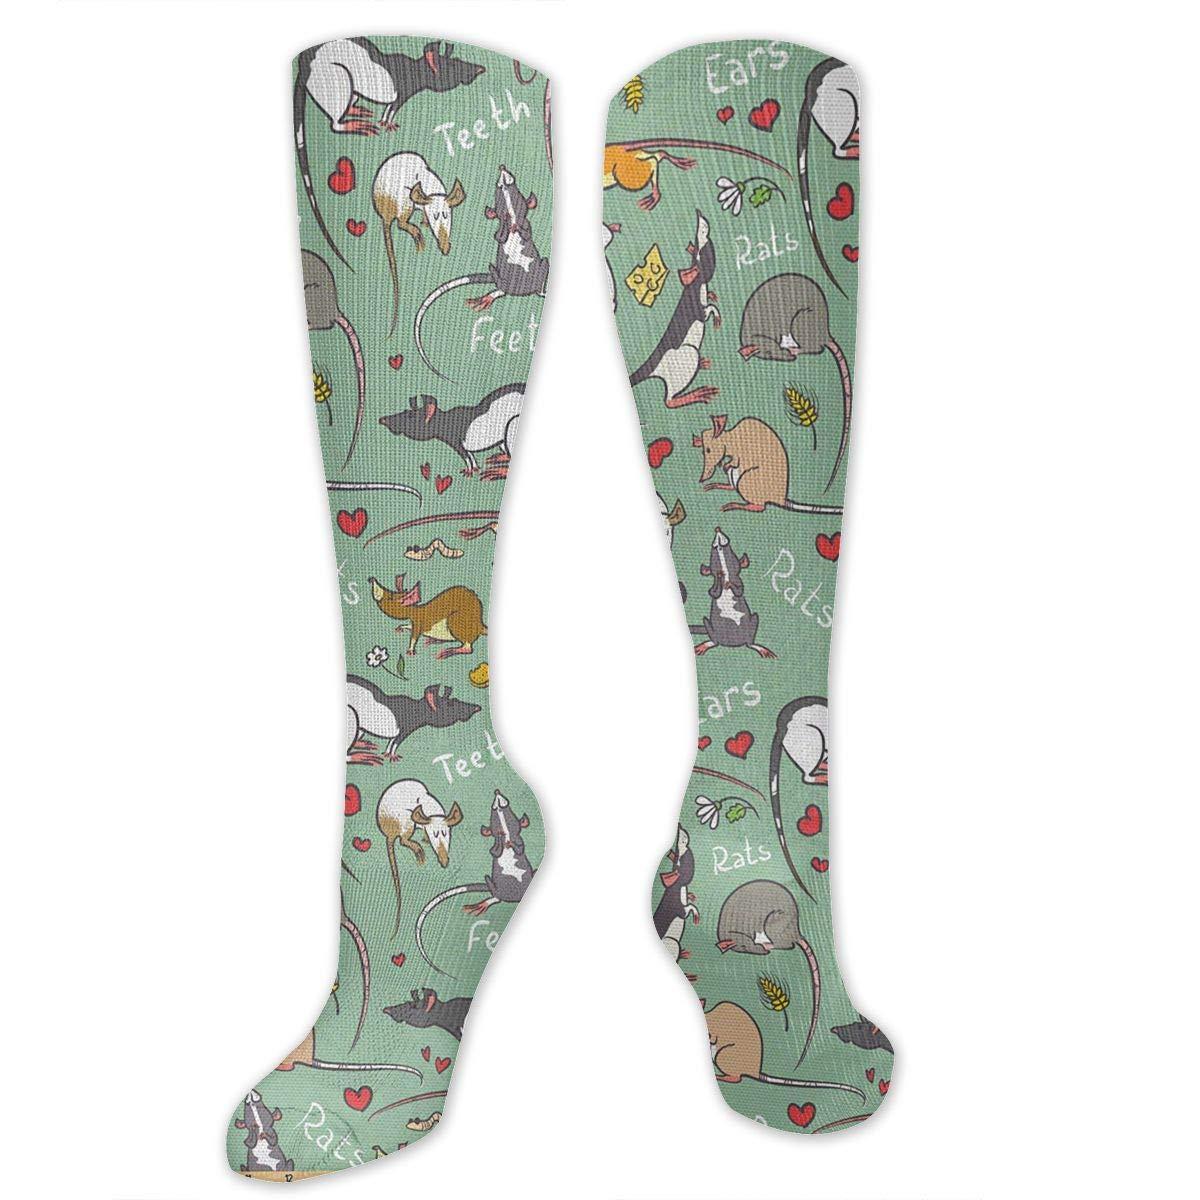 Chanwazibibiliu Cute Cartoon Rats Mens Colorful Dress Socks Funky Men Multicolored Pattern Fashionable Fun Crew Cotton Socks